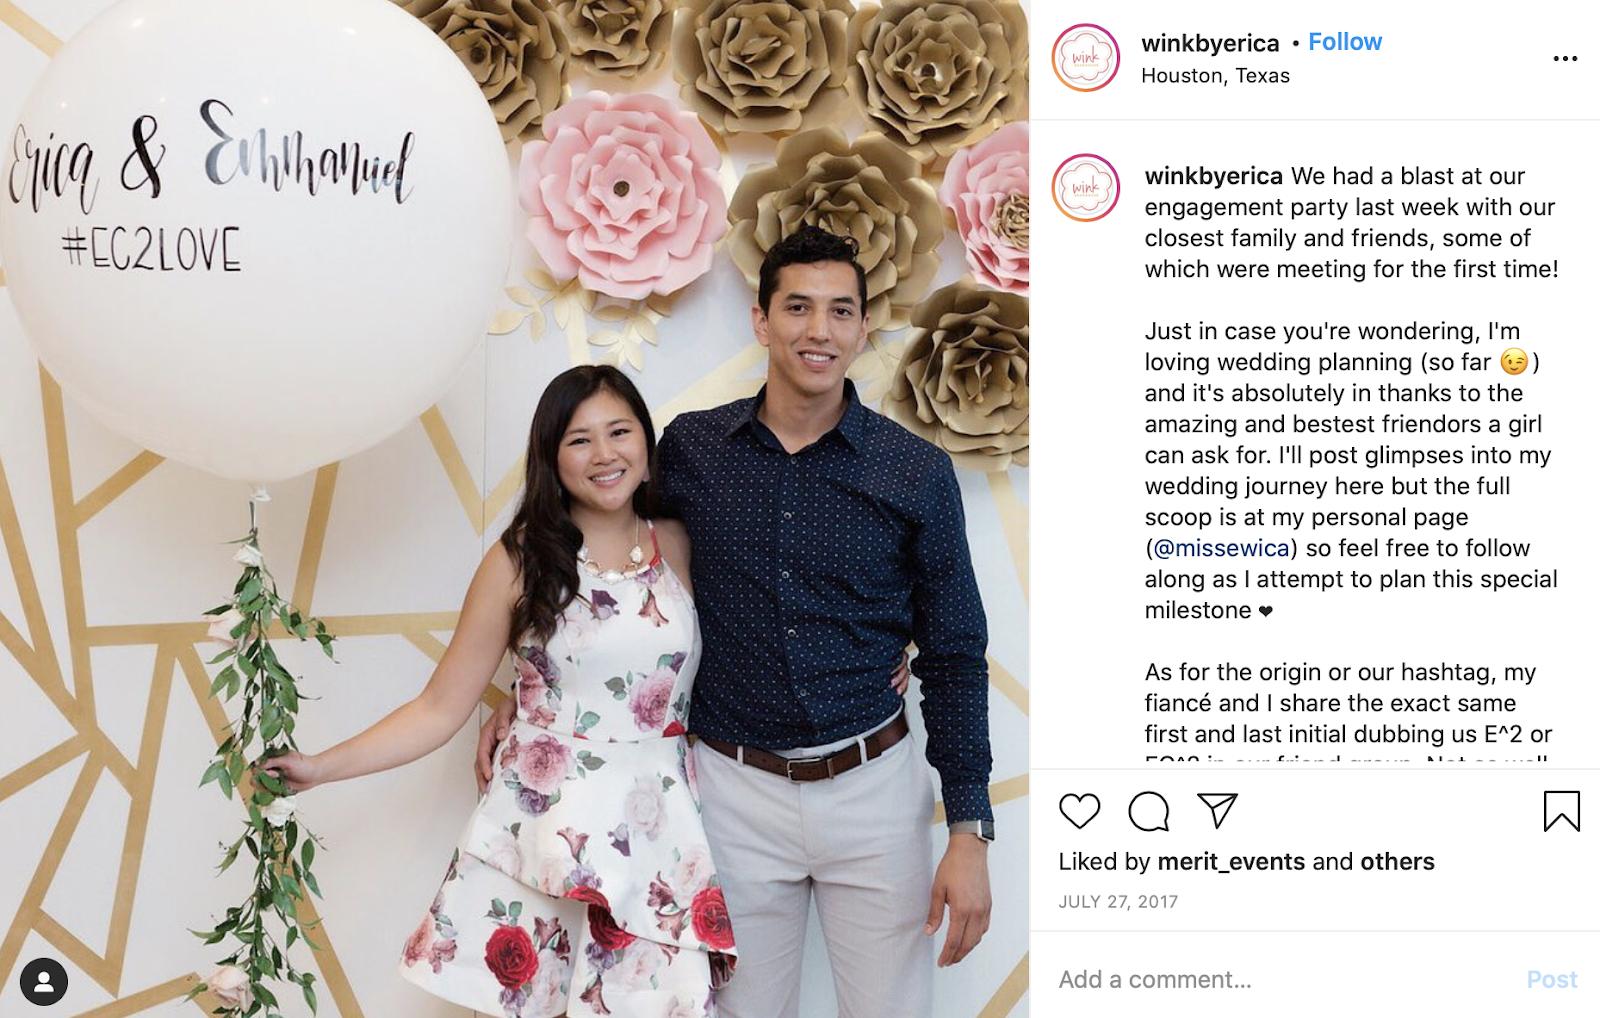 wedding hashtag creator - using your hashtag in engagement photos